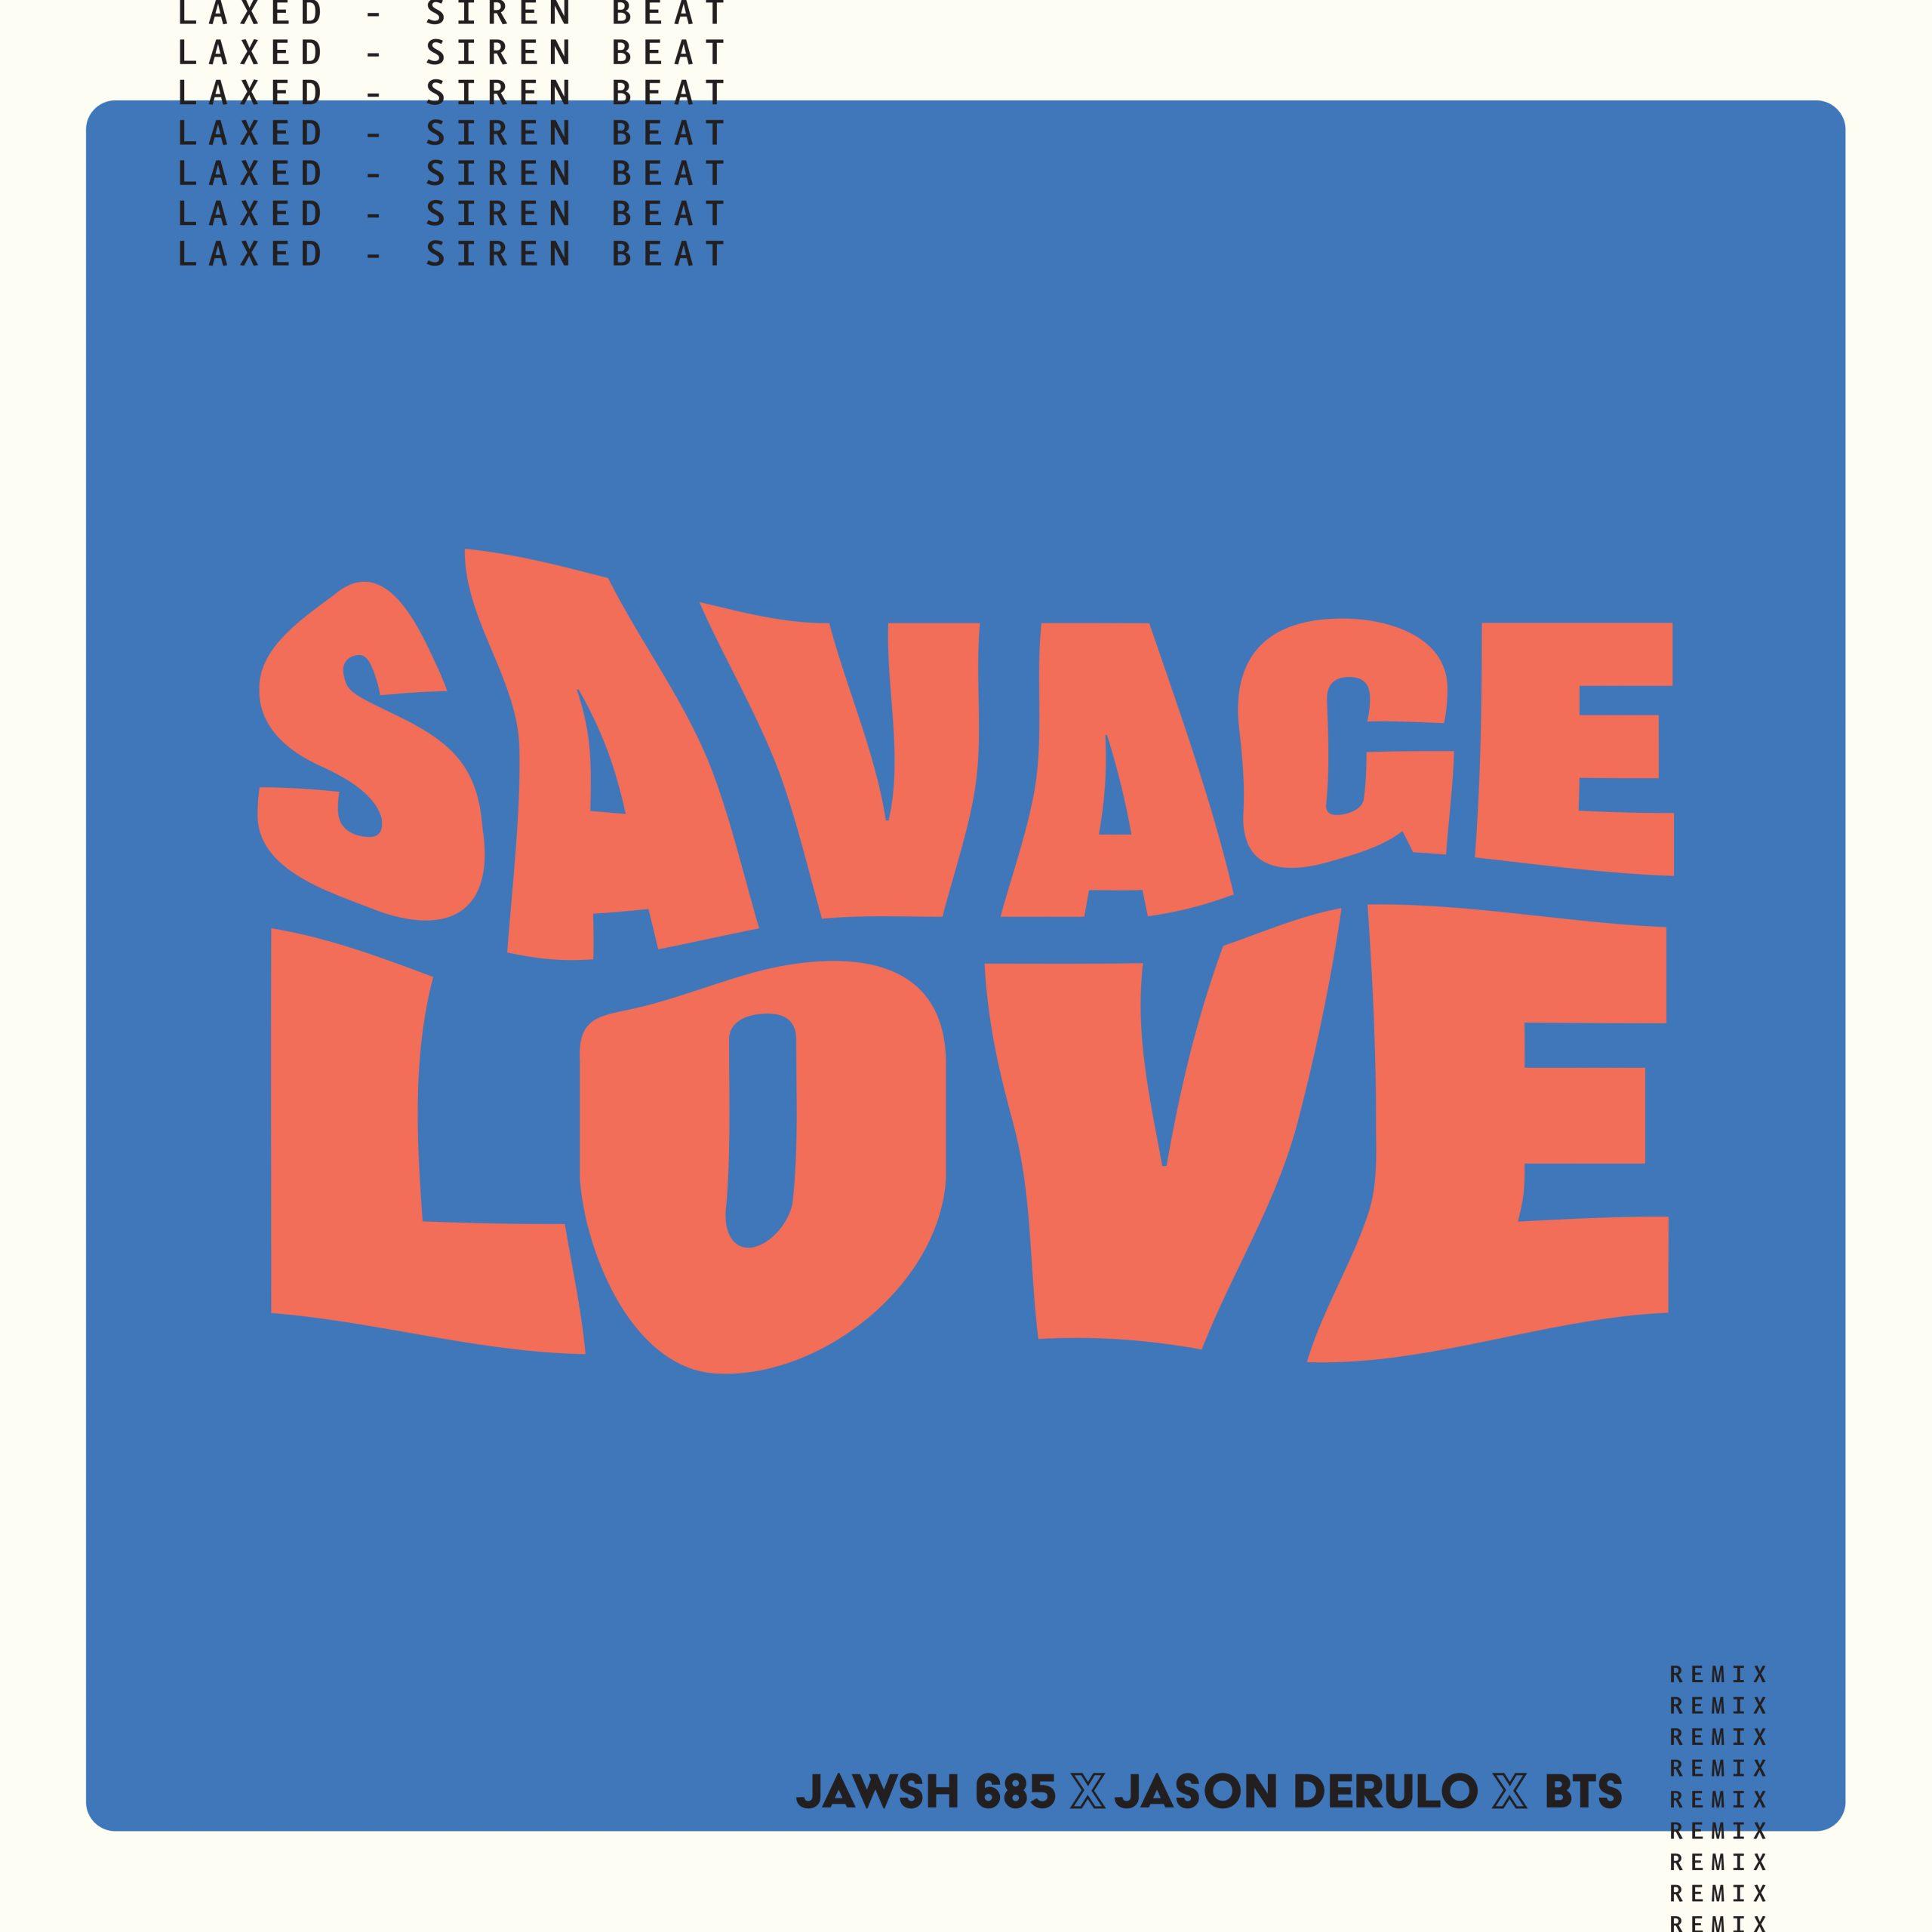 SAVAGE_LOVE_M1